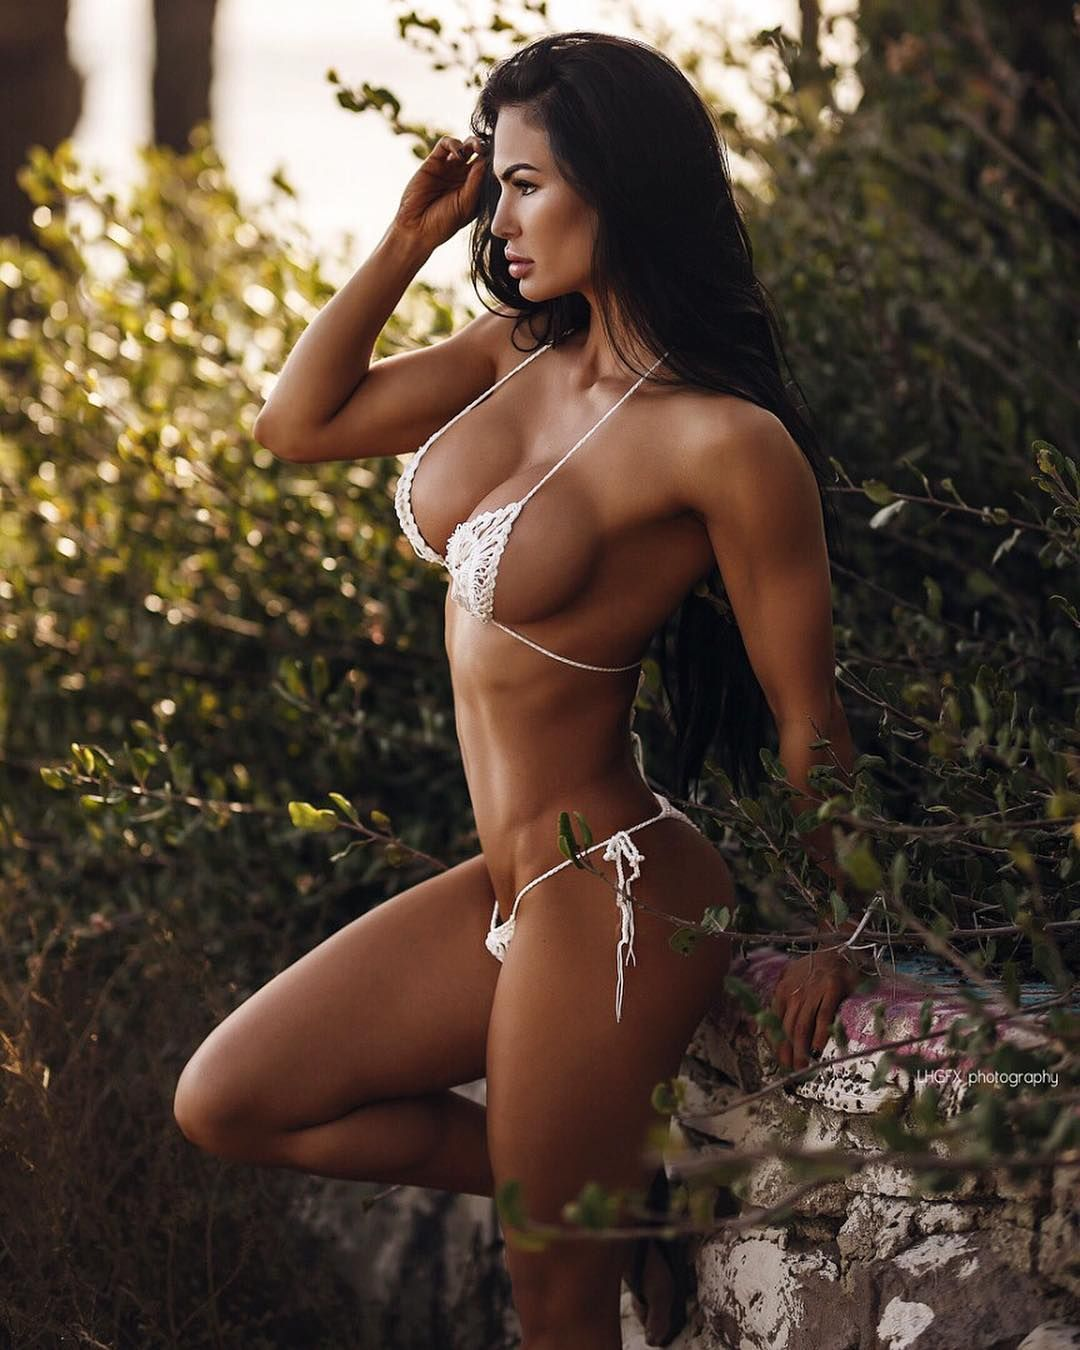 fitnes-modeli-grudastie-devushki-ulomali-parnya-na-seks-video